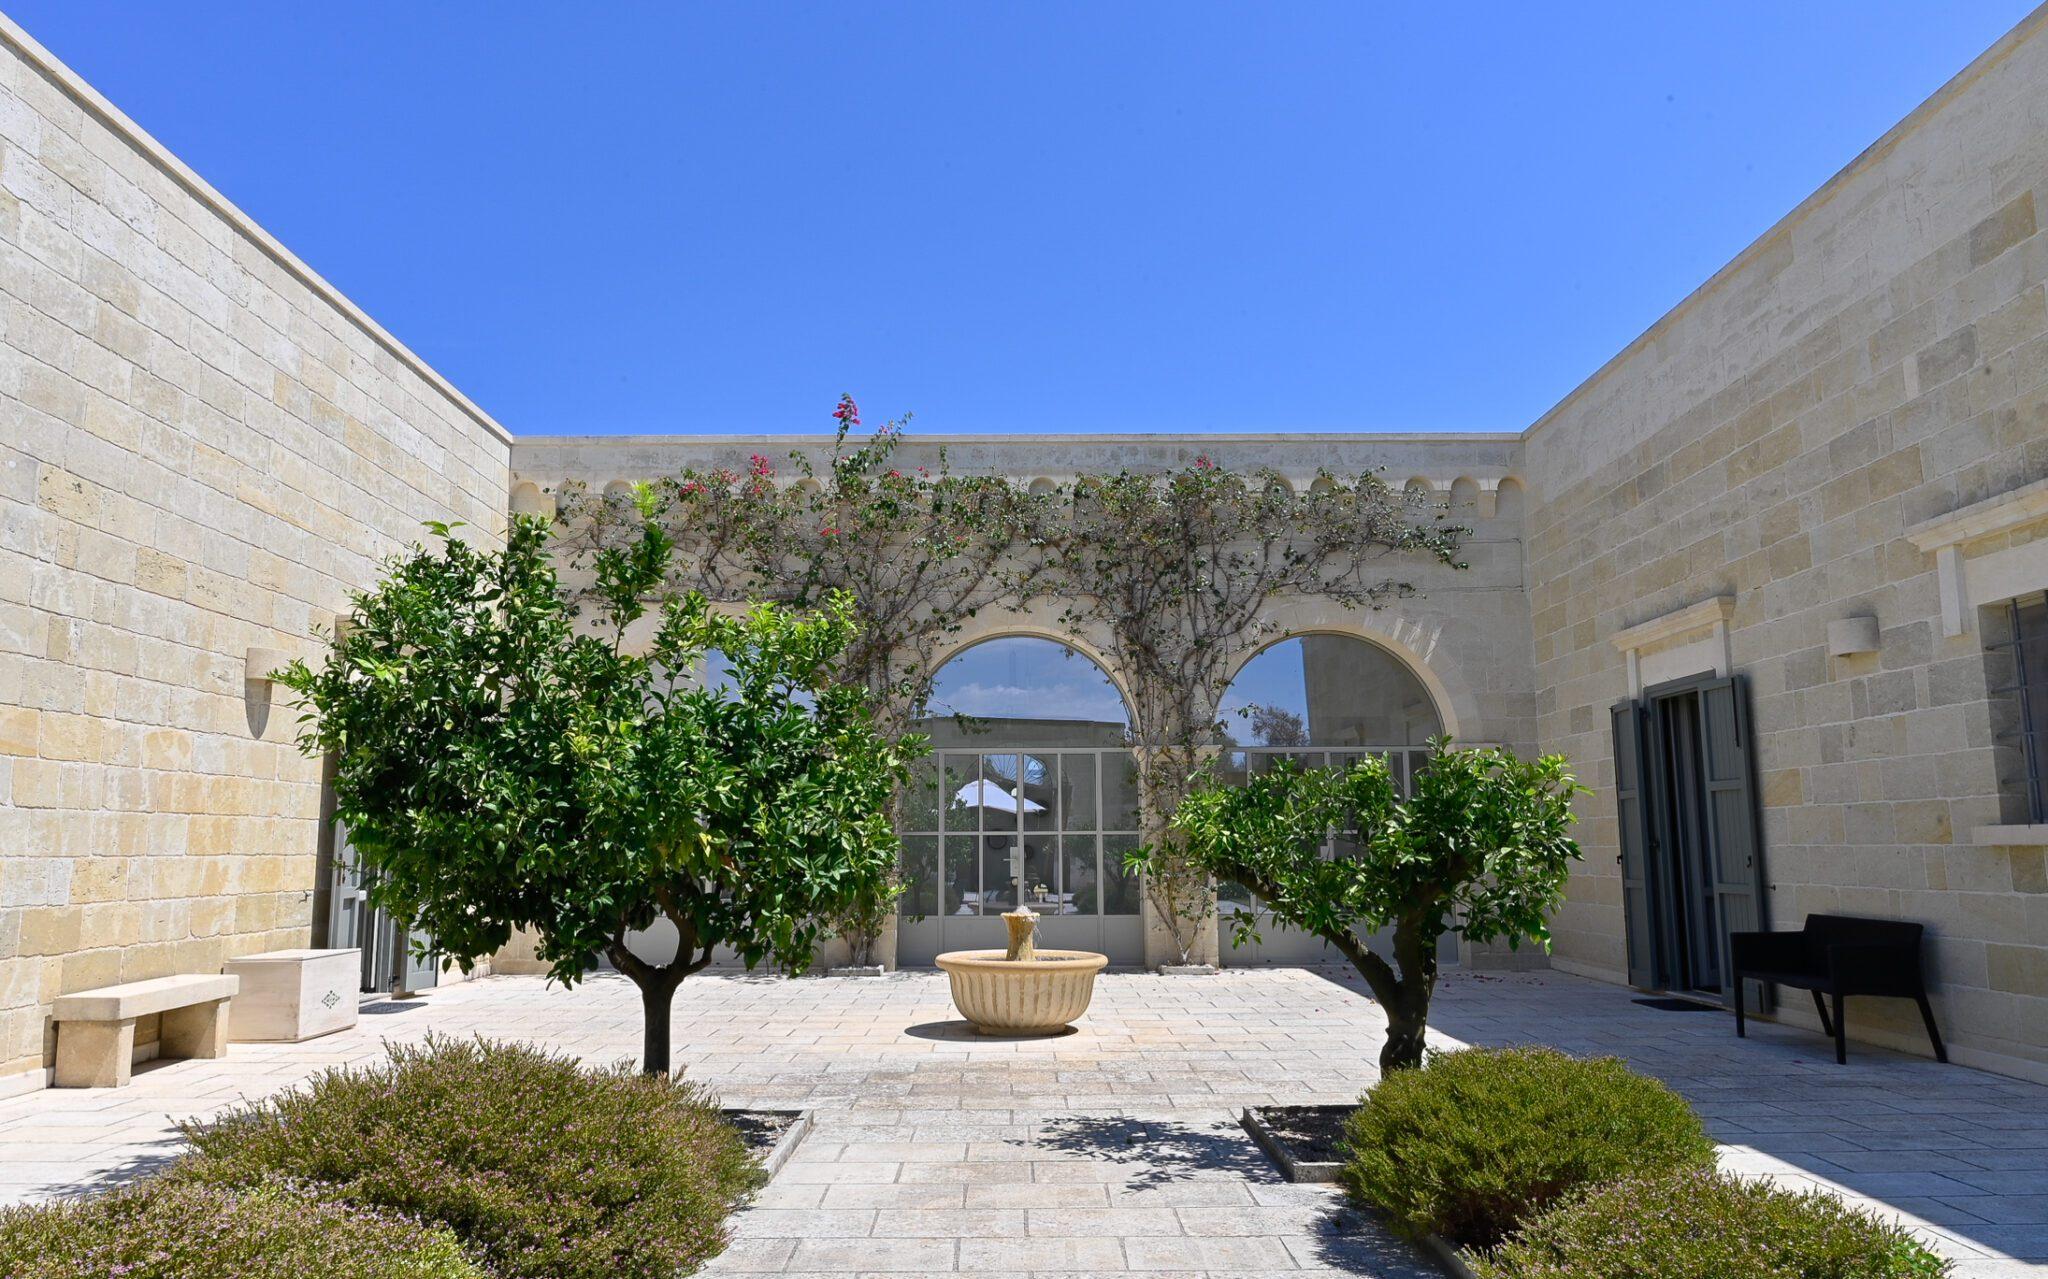 Nest Italy - Luxury Masseria in Salento, Puglia